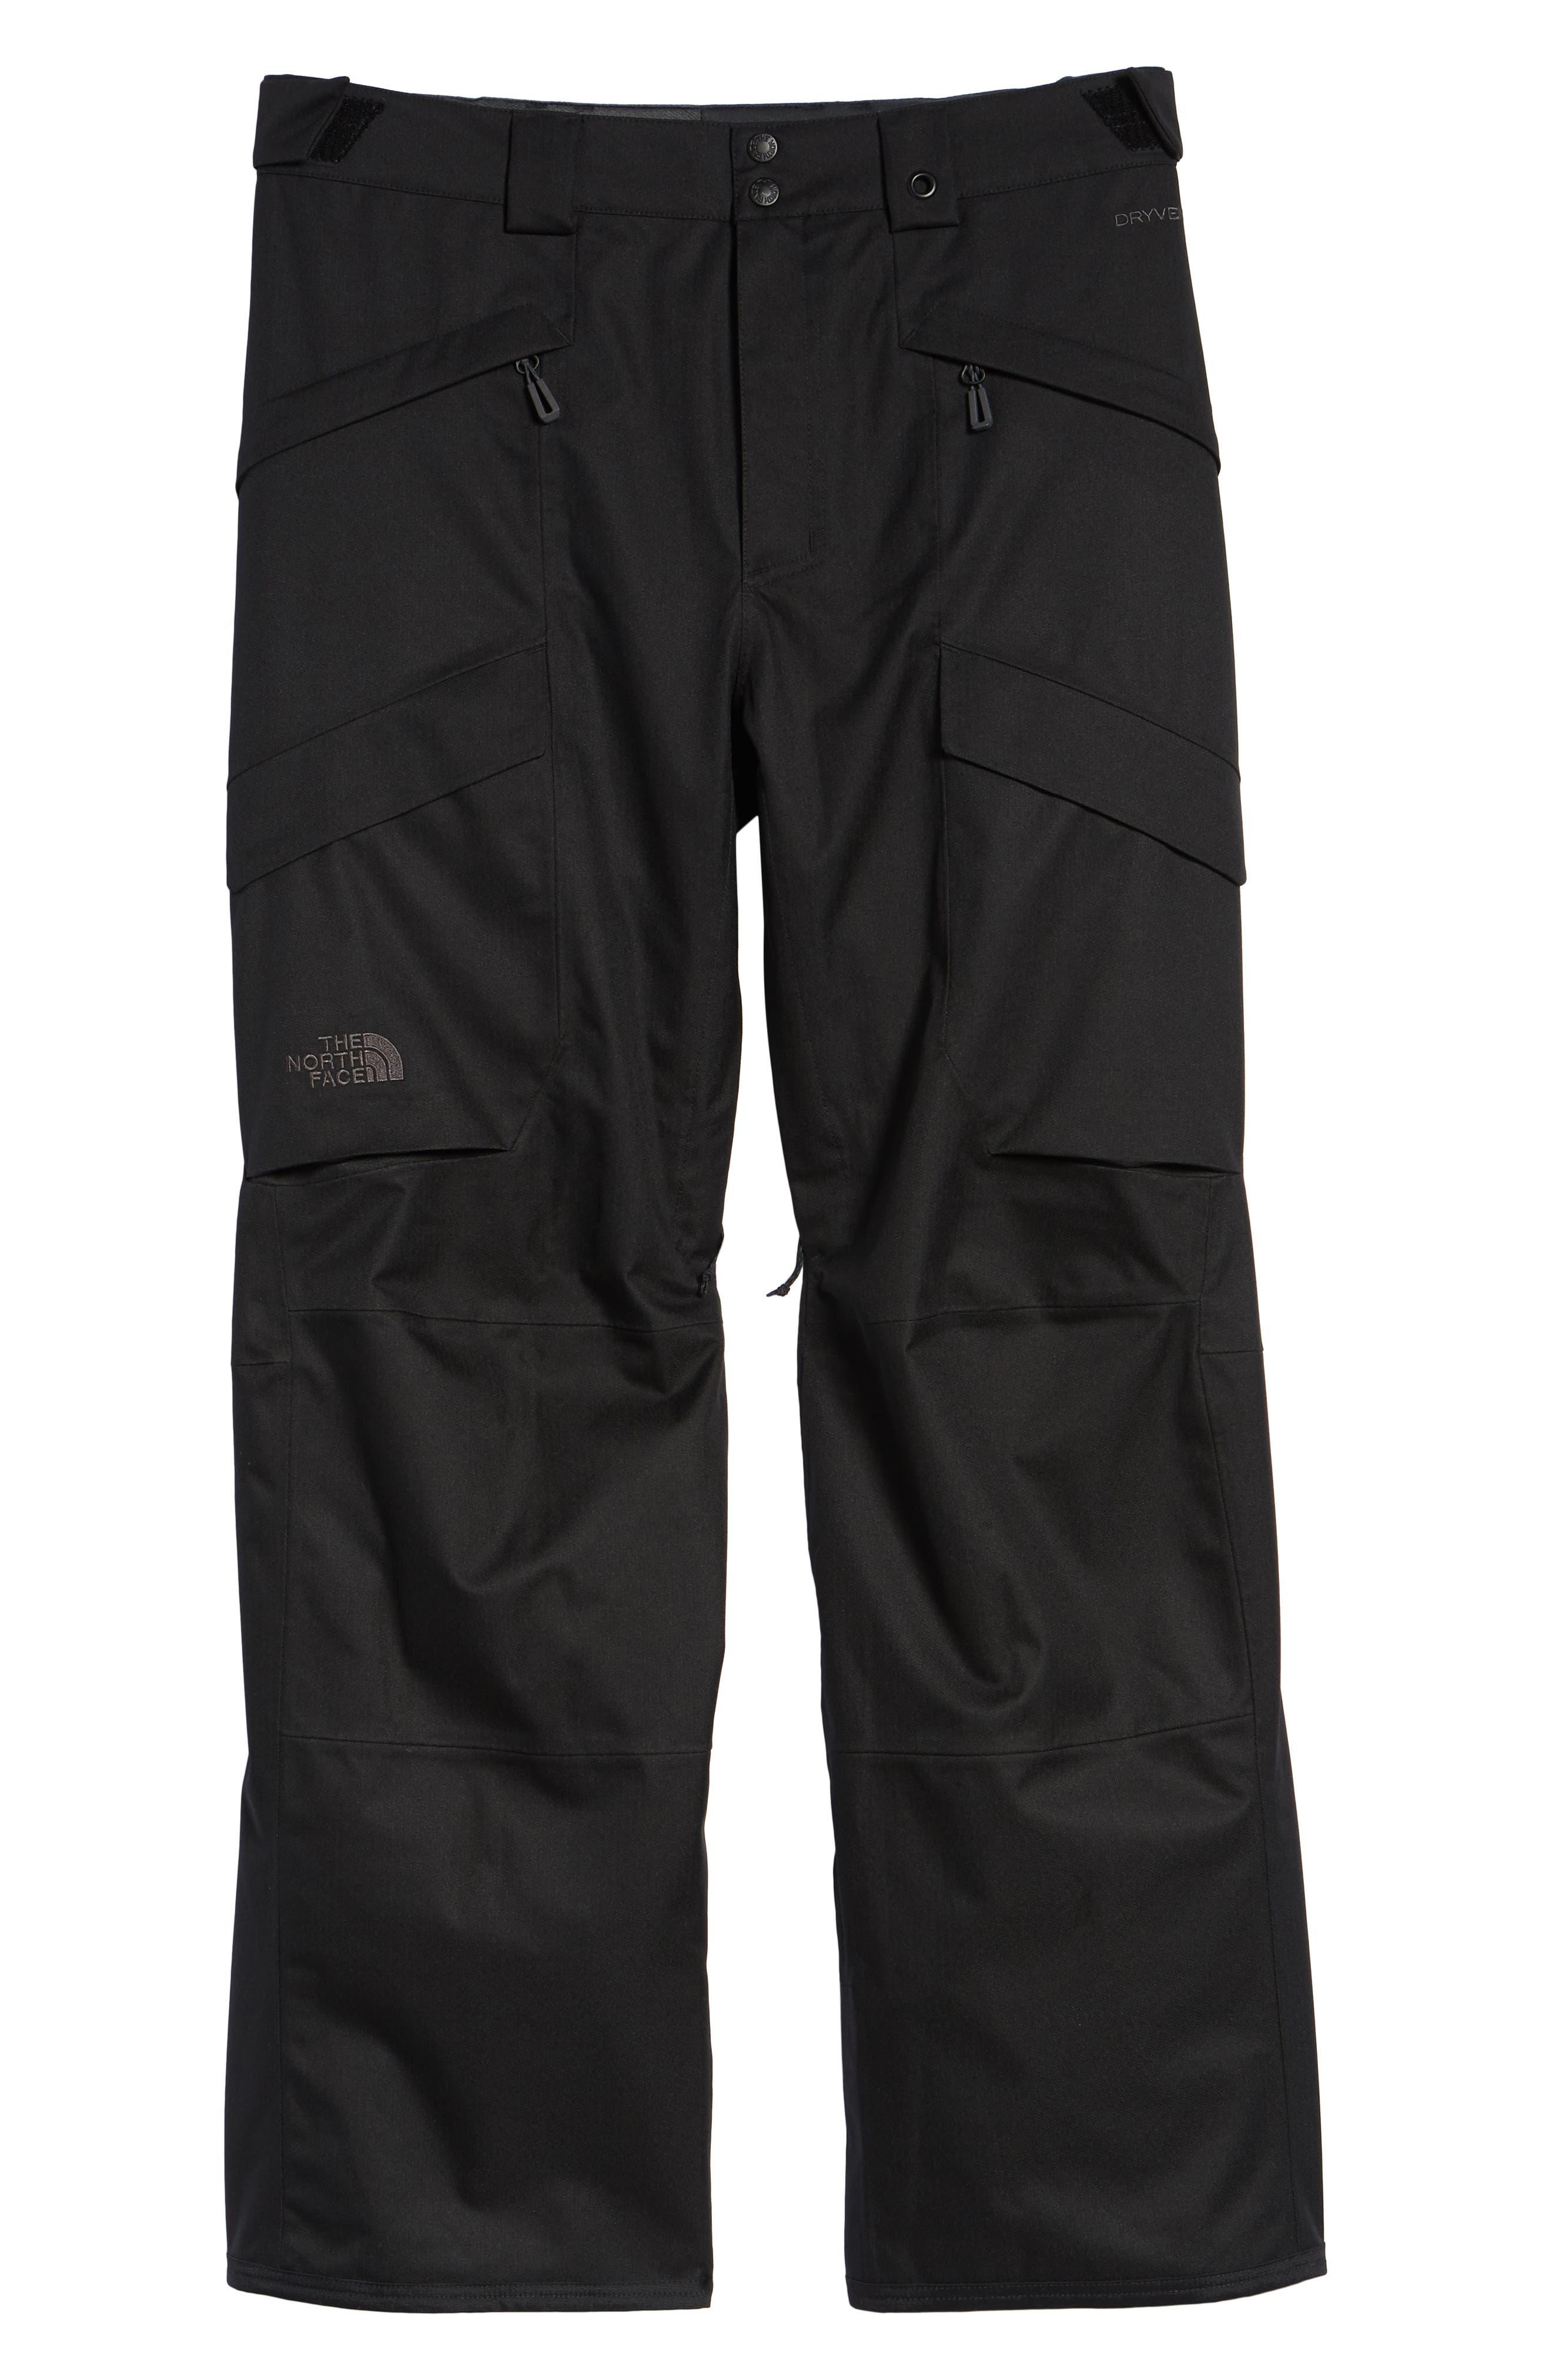 Gatekeeper Waterproof Pants,                             Alternate thumbnail 6, color,                             TNF BLACK/TNF BLACK